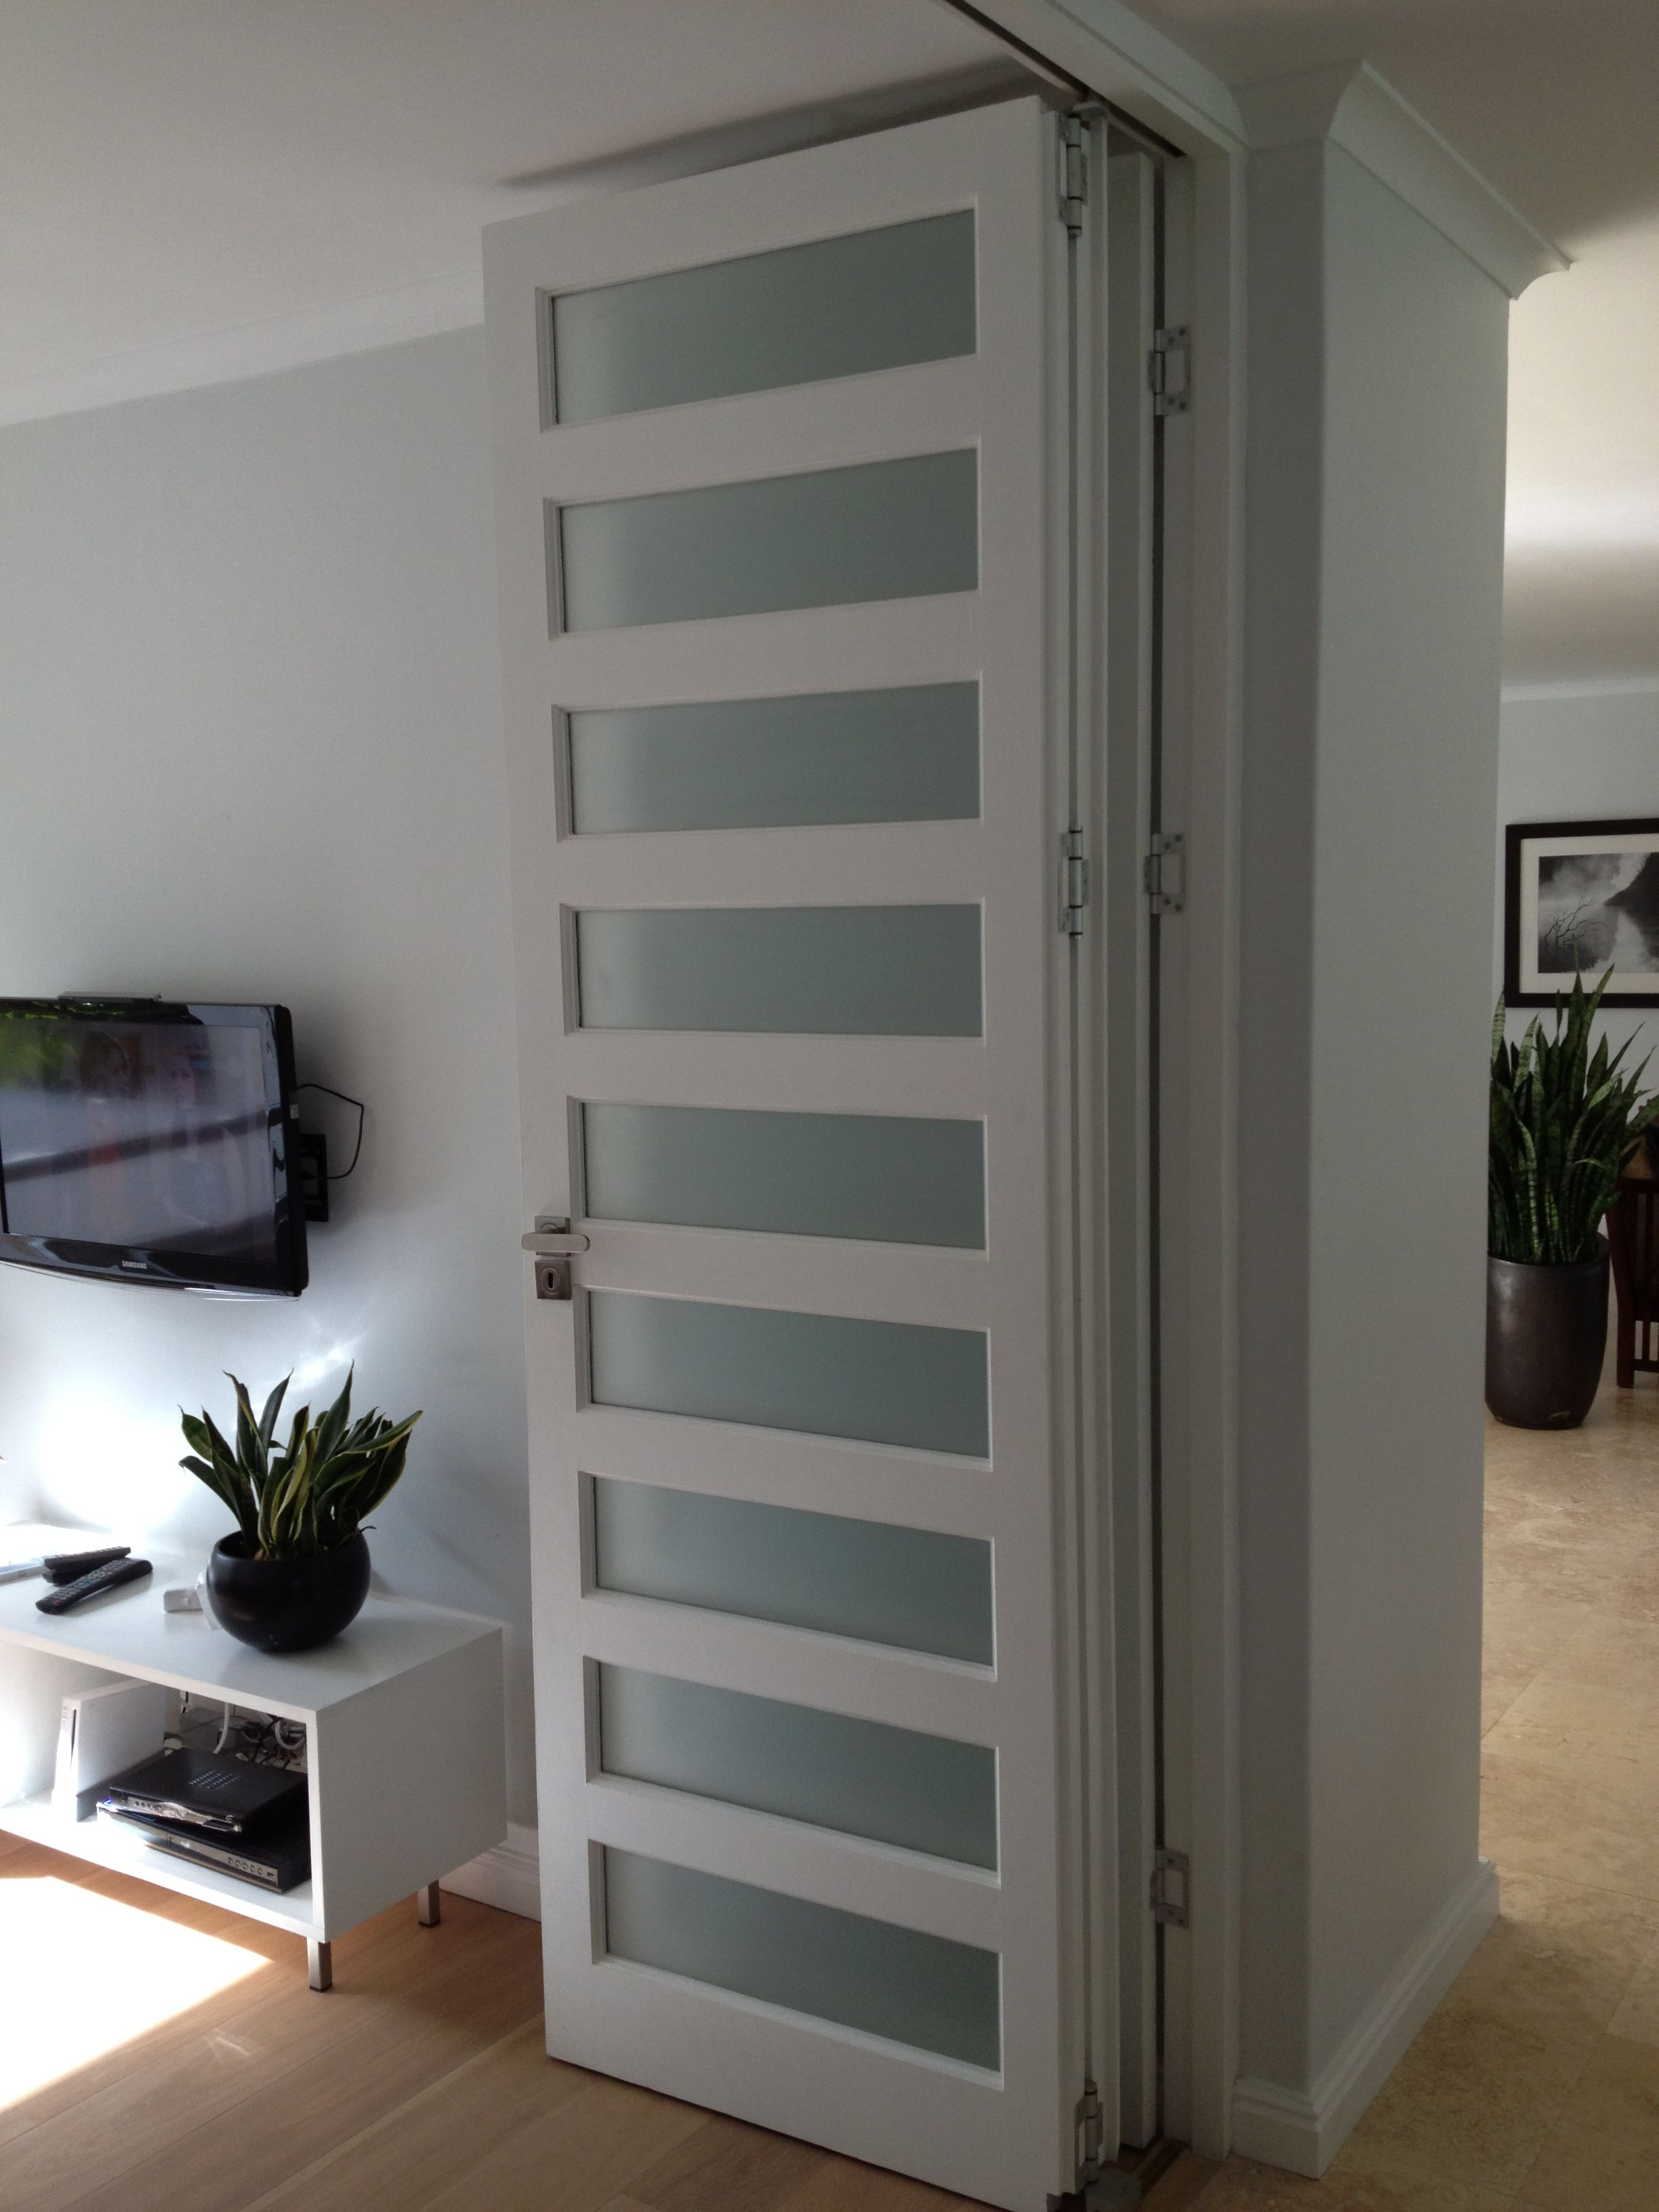 Folding Room Divider Door And Window Decor